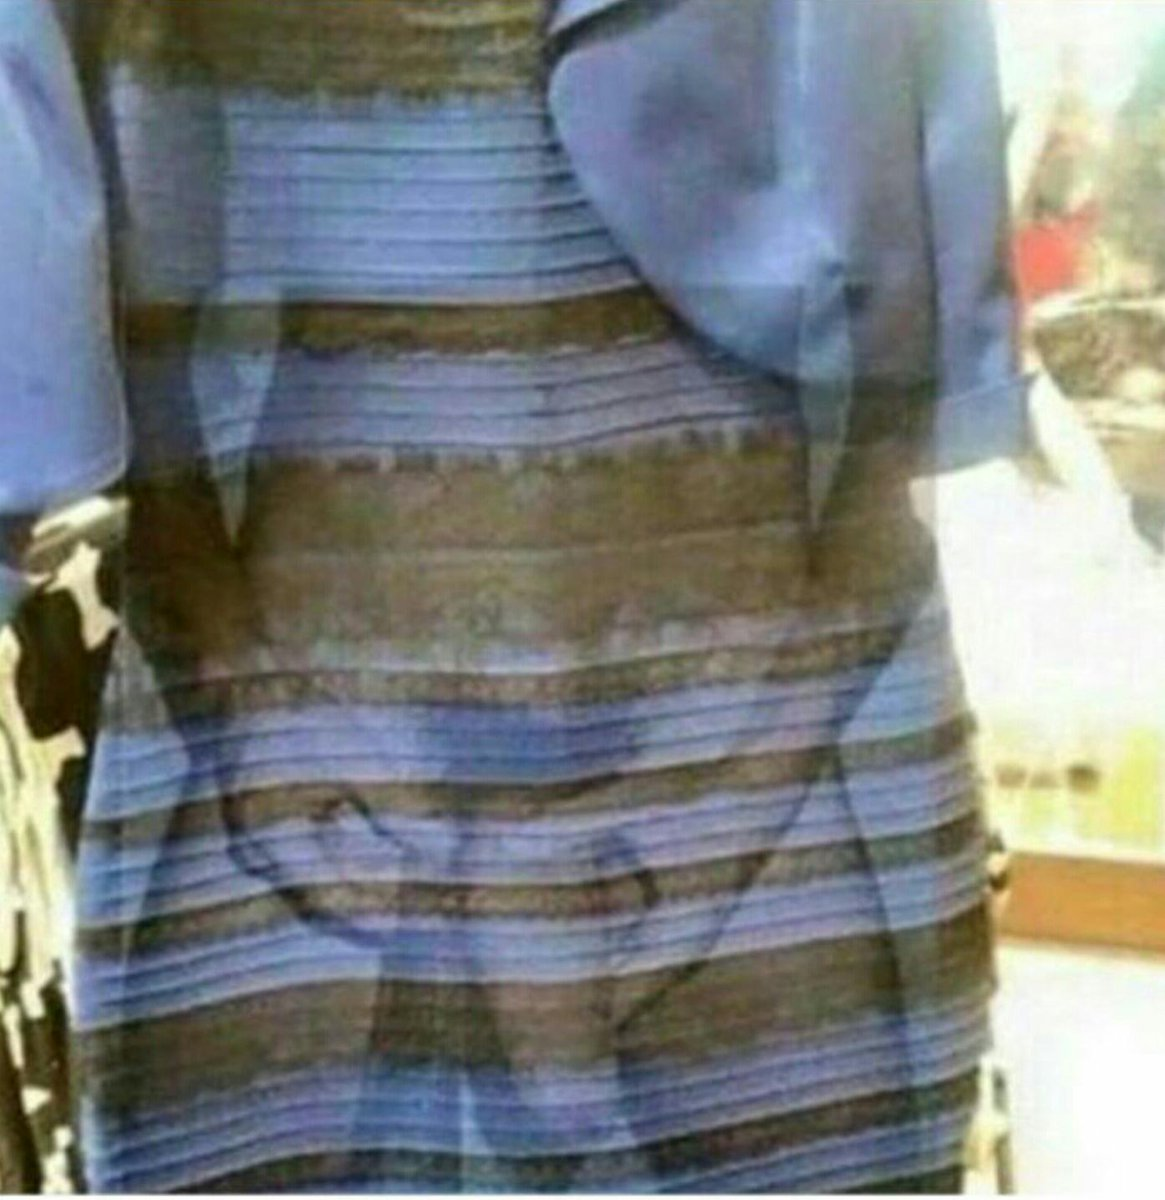 Jezucrihto Xd On Twitter La Puta Verdad Sobre El Vestido Q